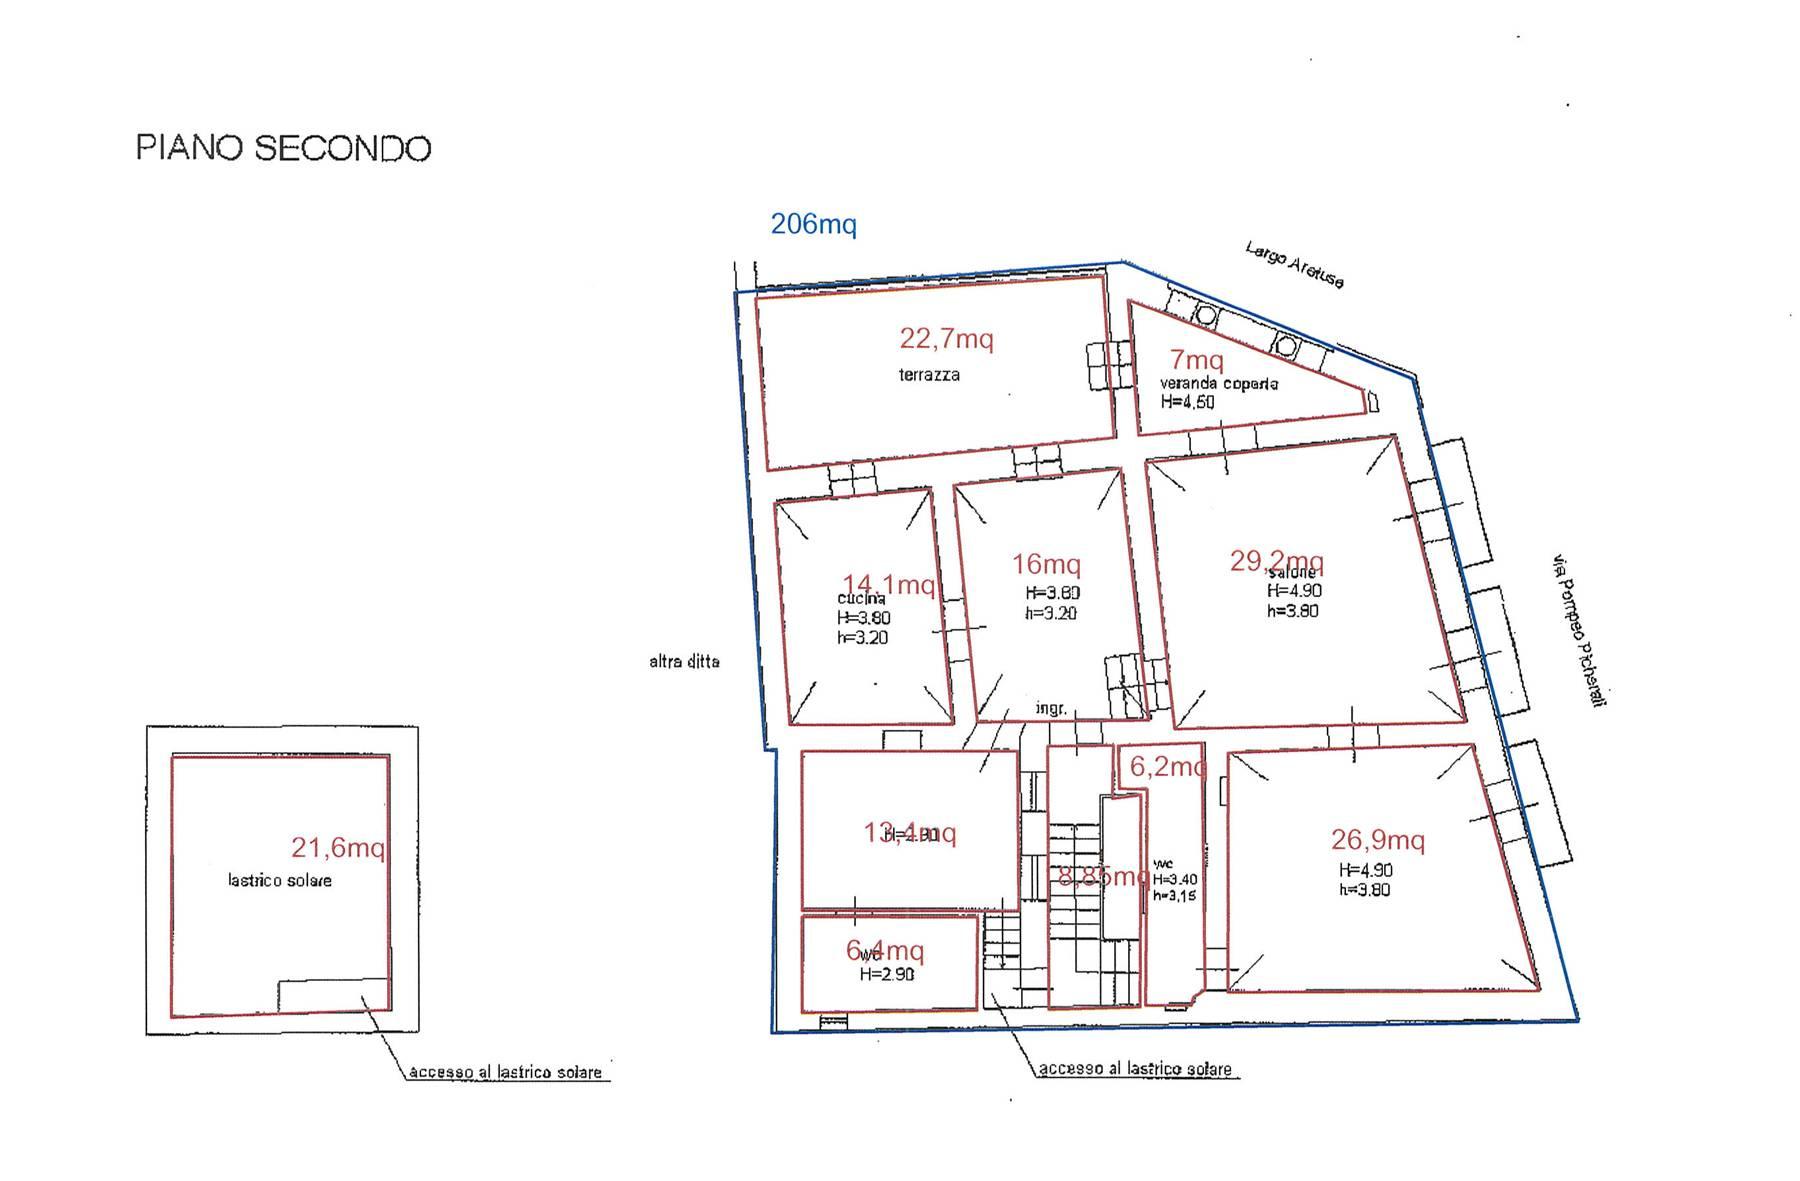 Appartamento in Vendita a Siracusa: 5 locali, 206 mq - Foto 30